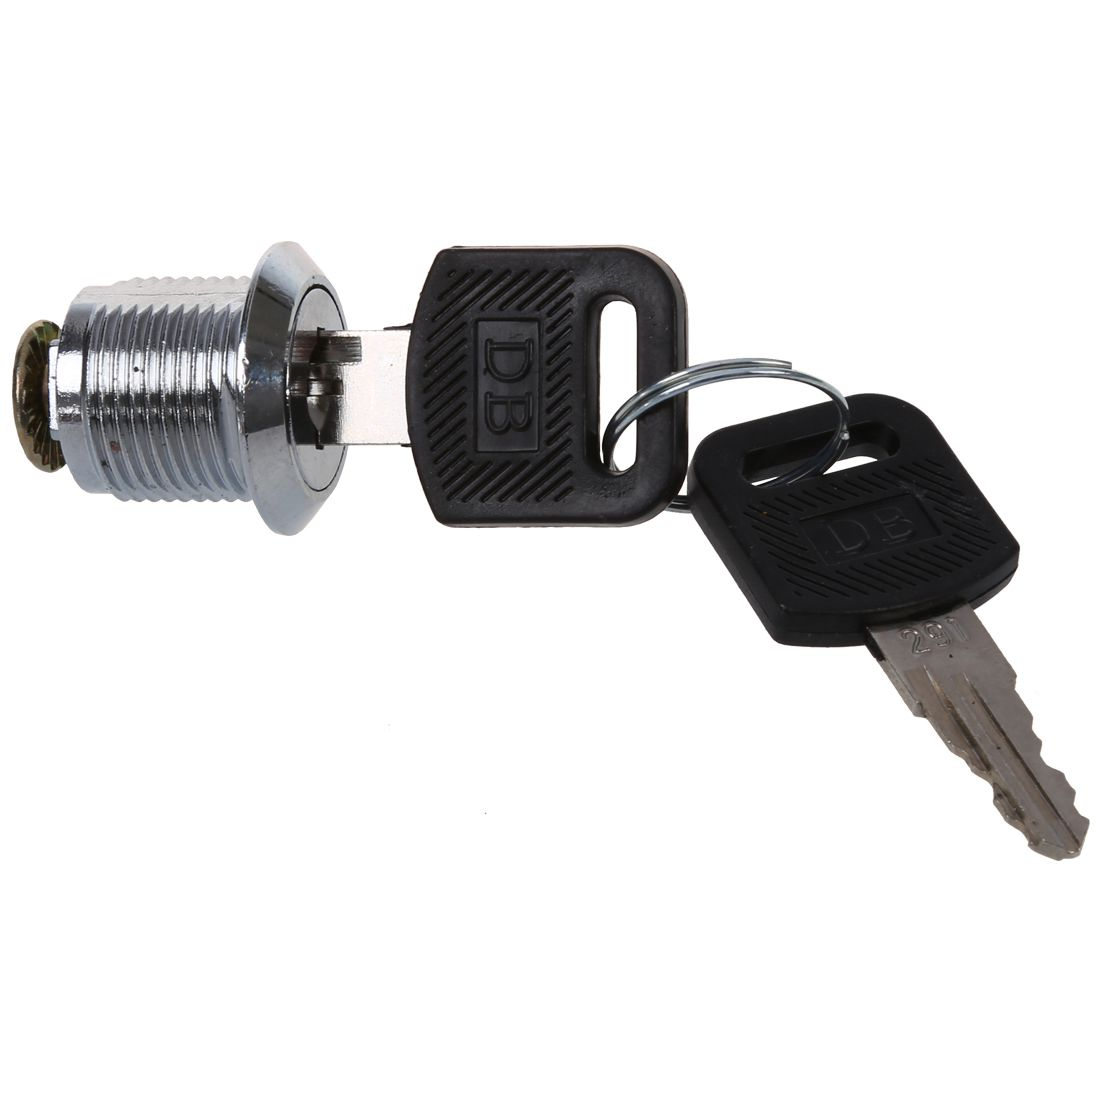 Tool Box Cabinet Locking 19mm Dia Thread Cylinder Cam Lock ...